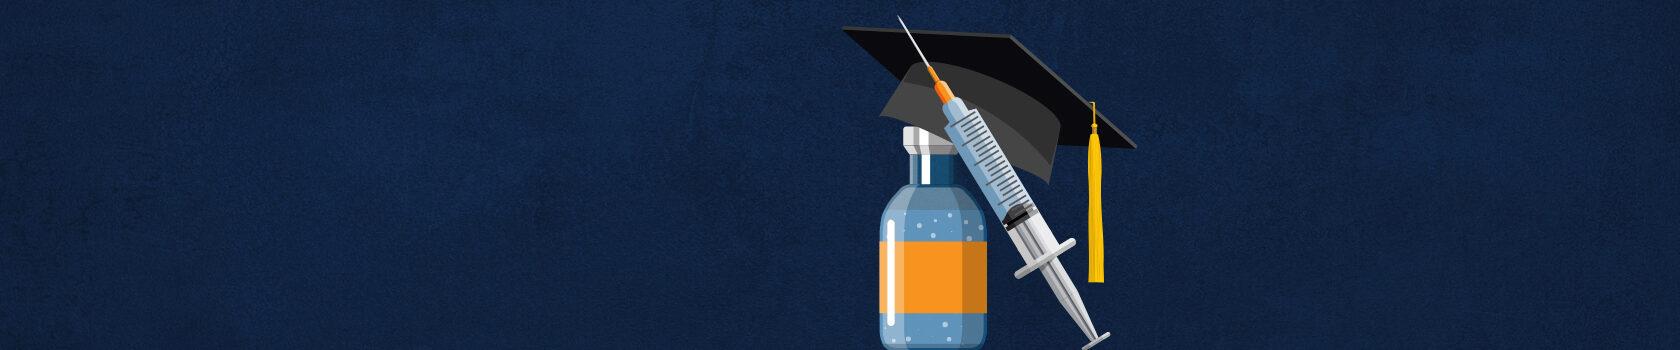 Vaccine Inventive Program slider image